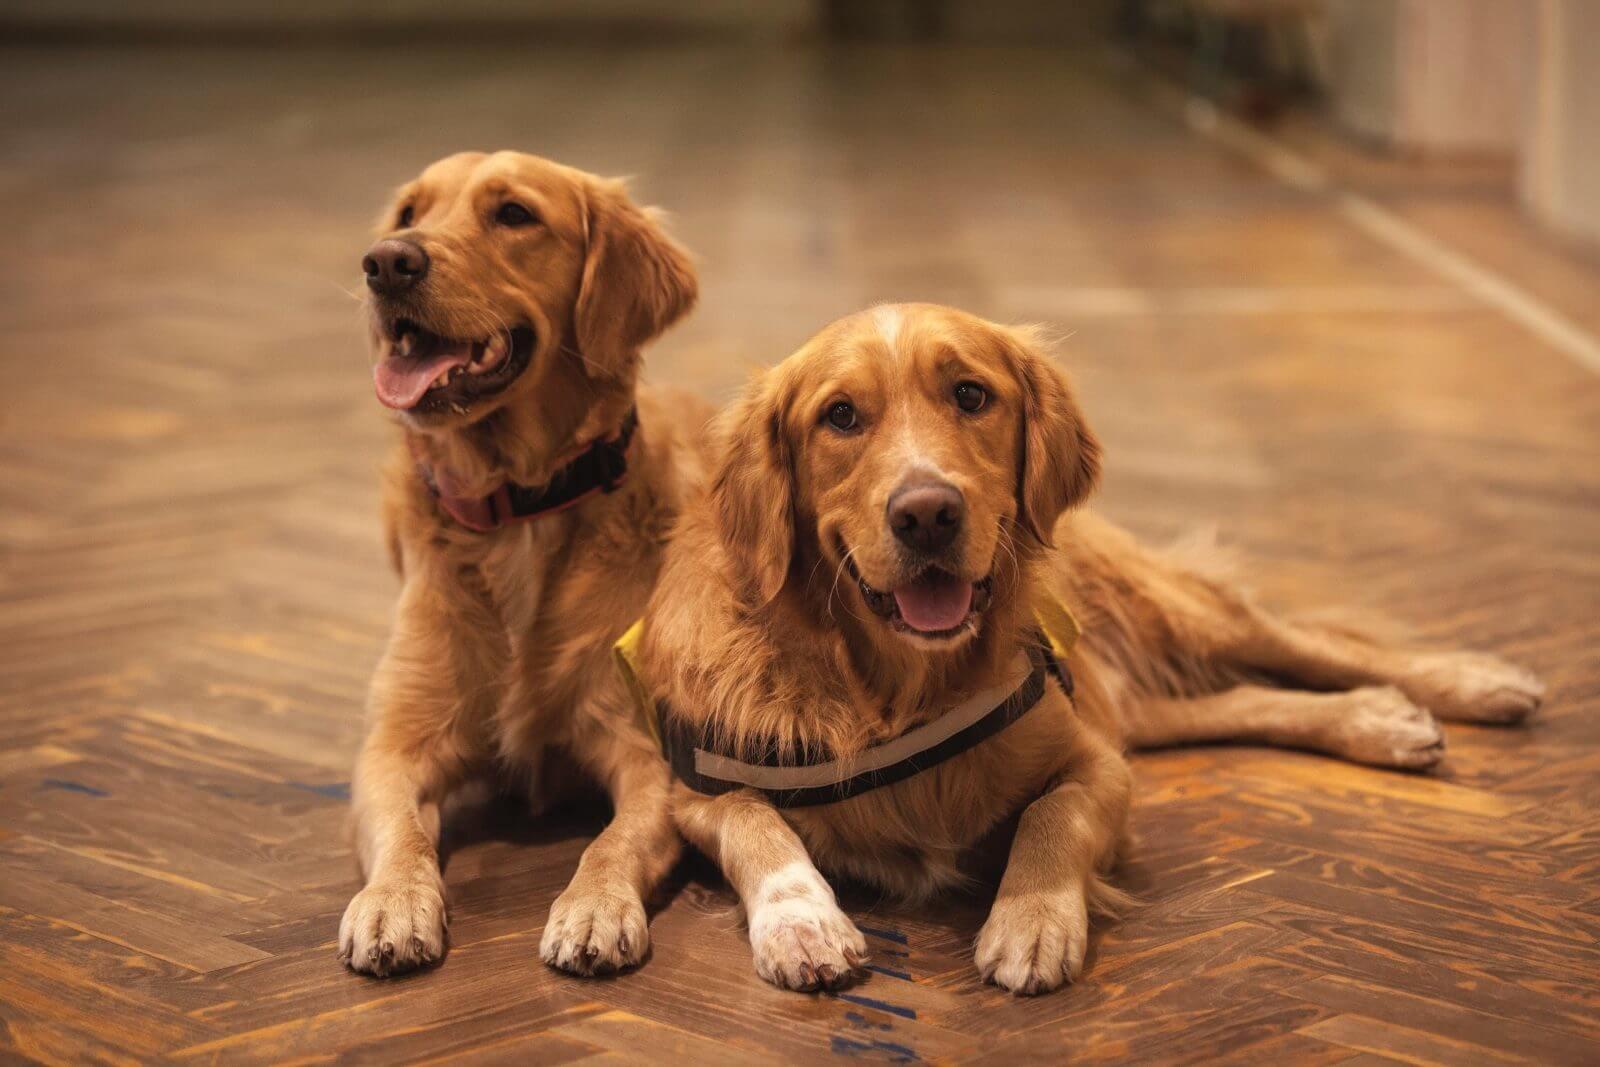 Anjing Golden : Karakter, Variasi Jenis, kelebihan & Harga (Update) 16